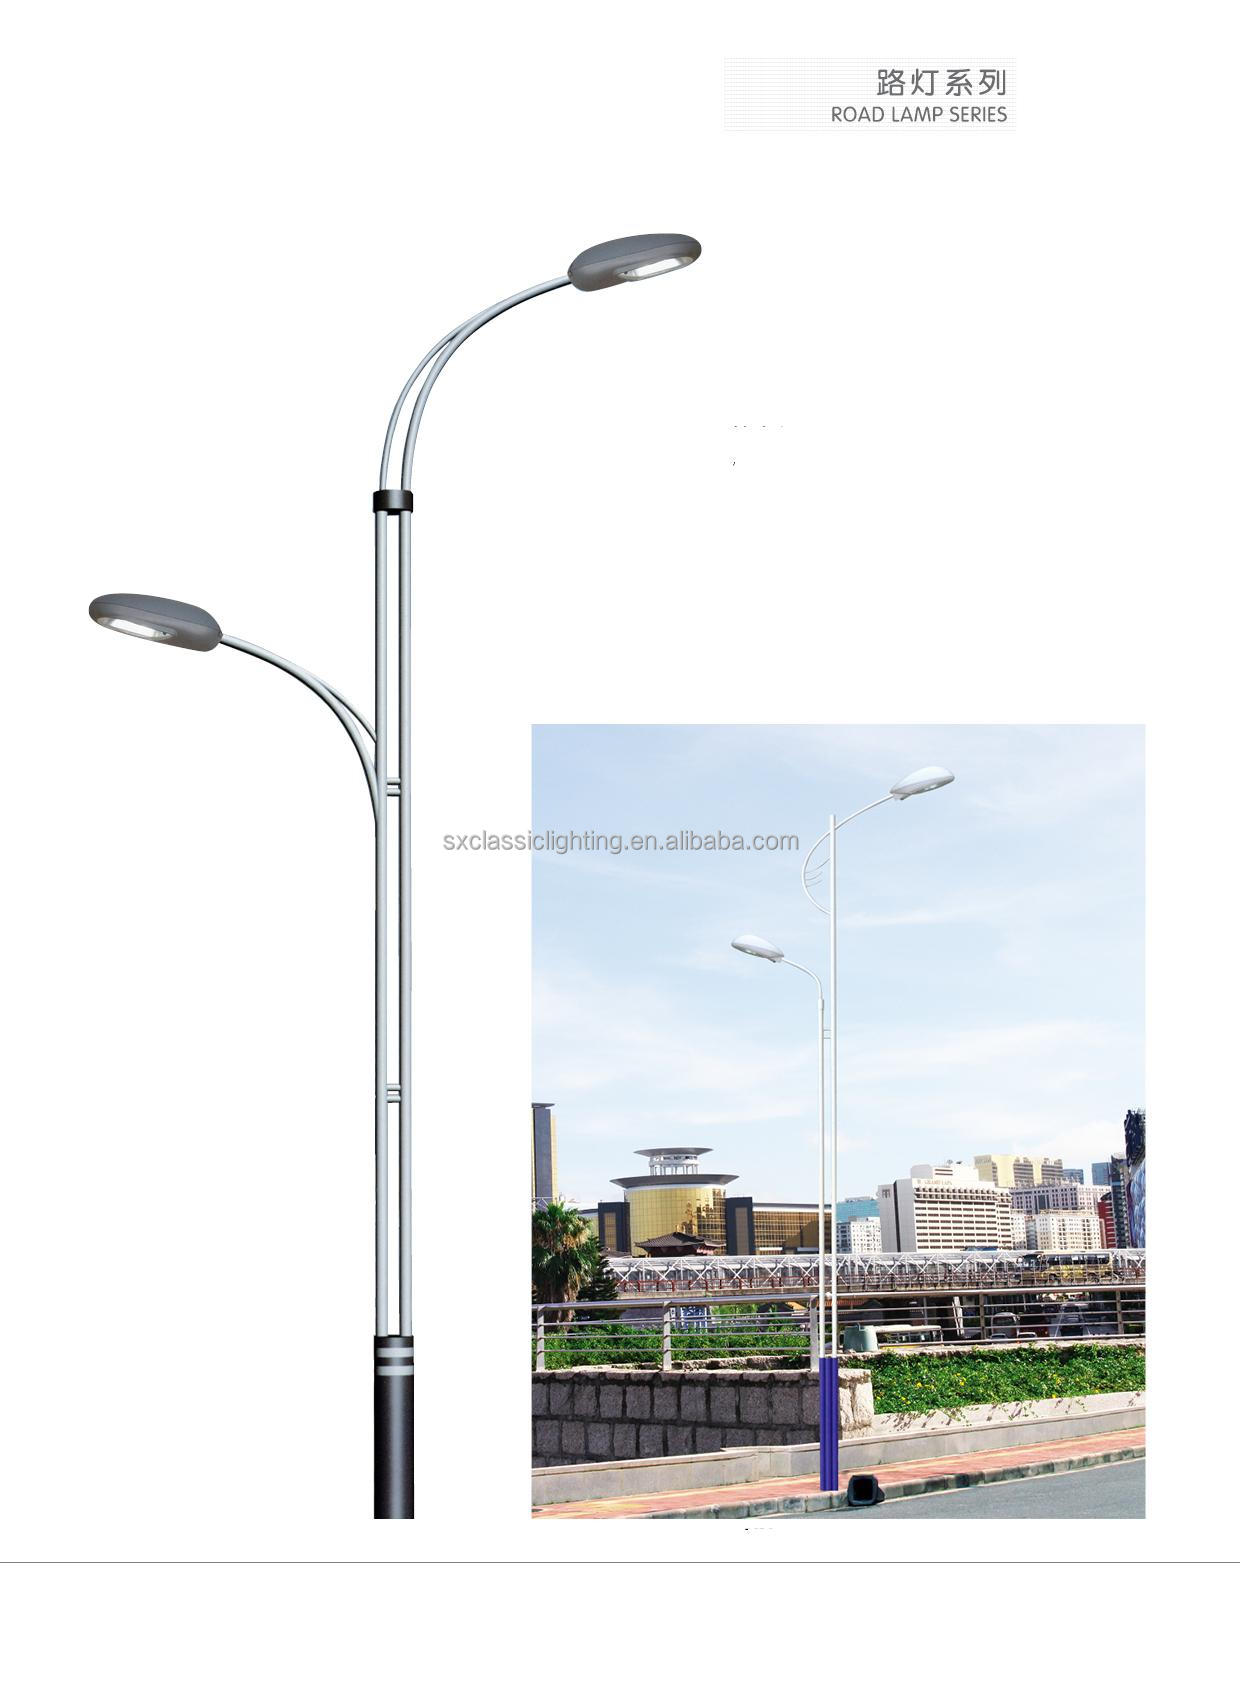 Solar Lamp Post Conversion Kit Street Light Pole Price Malaysia ...